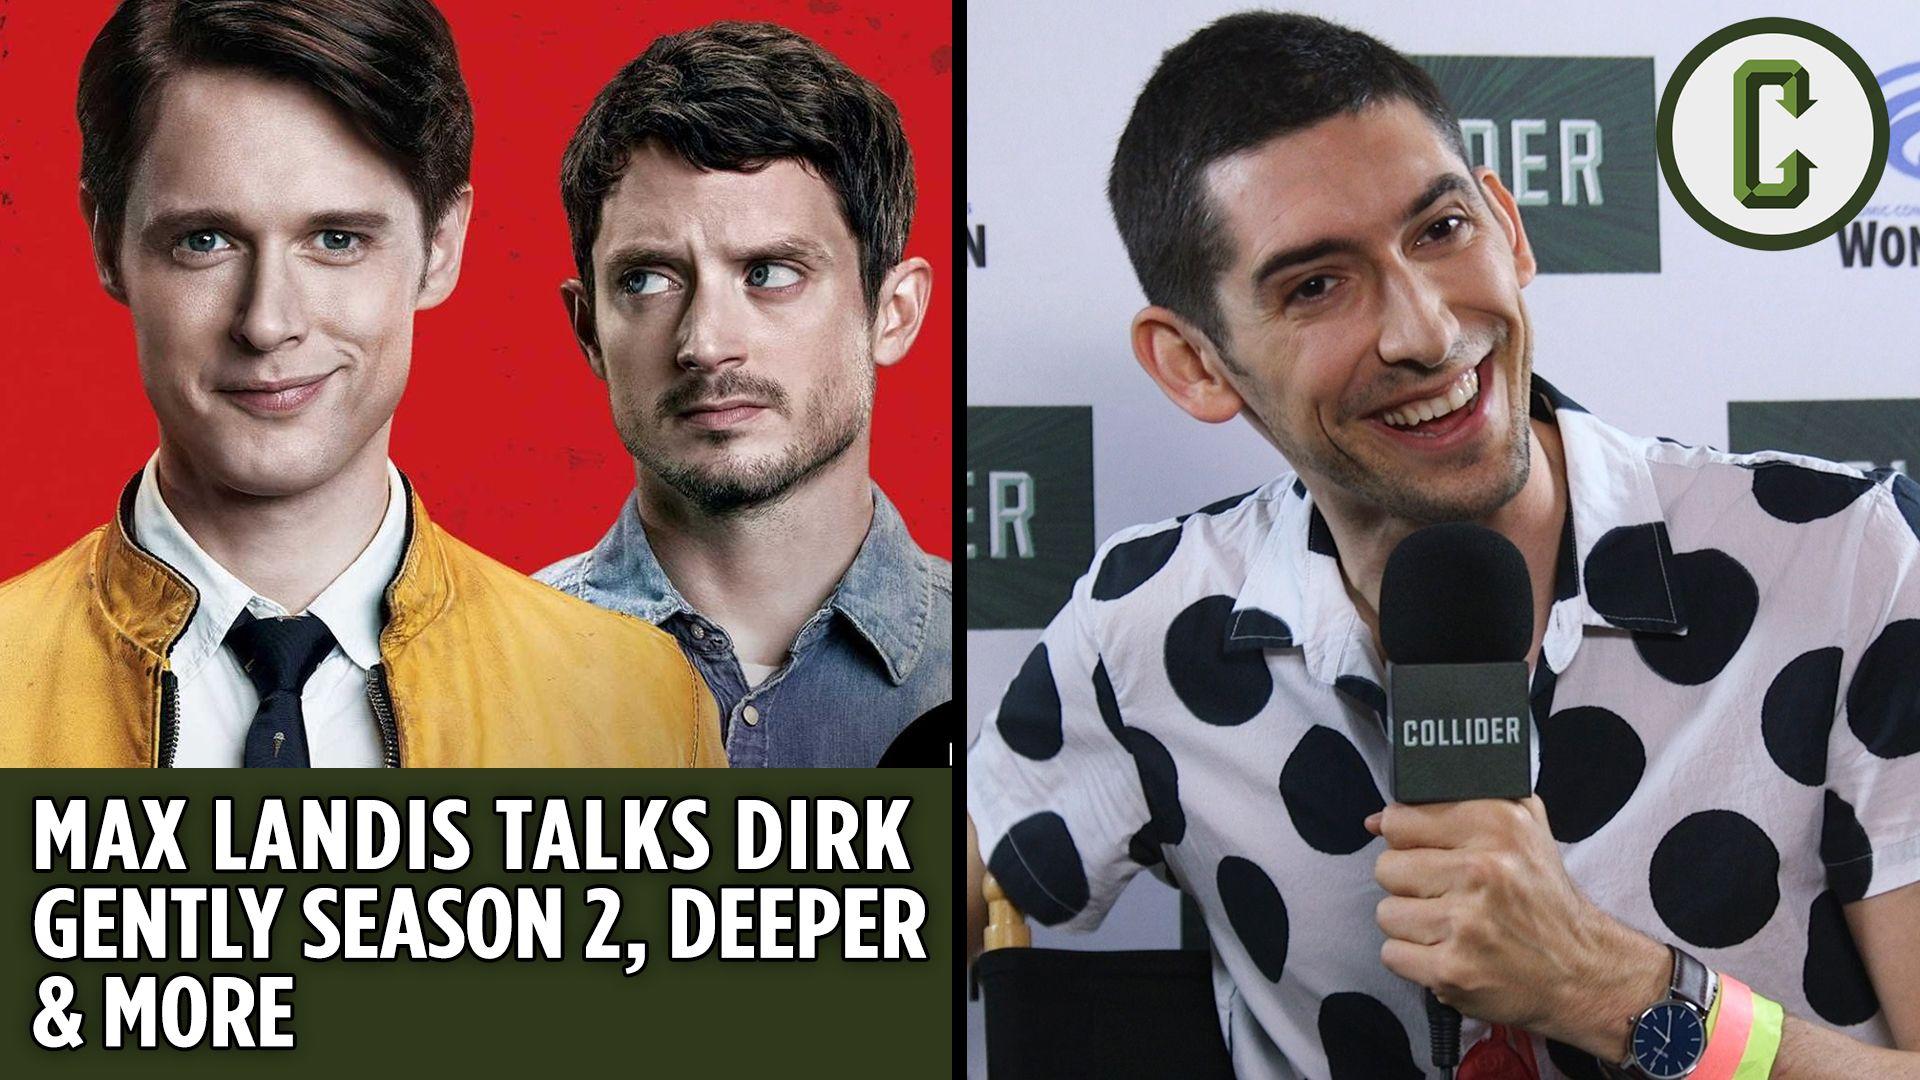 Dirk Gently Season 2